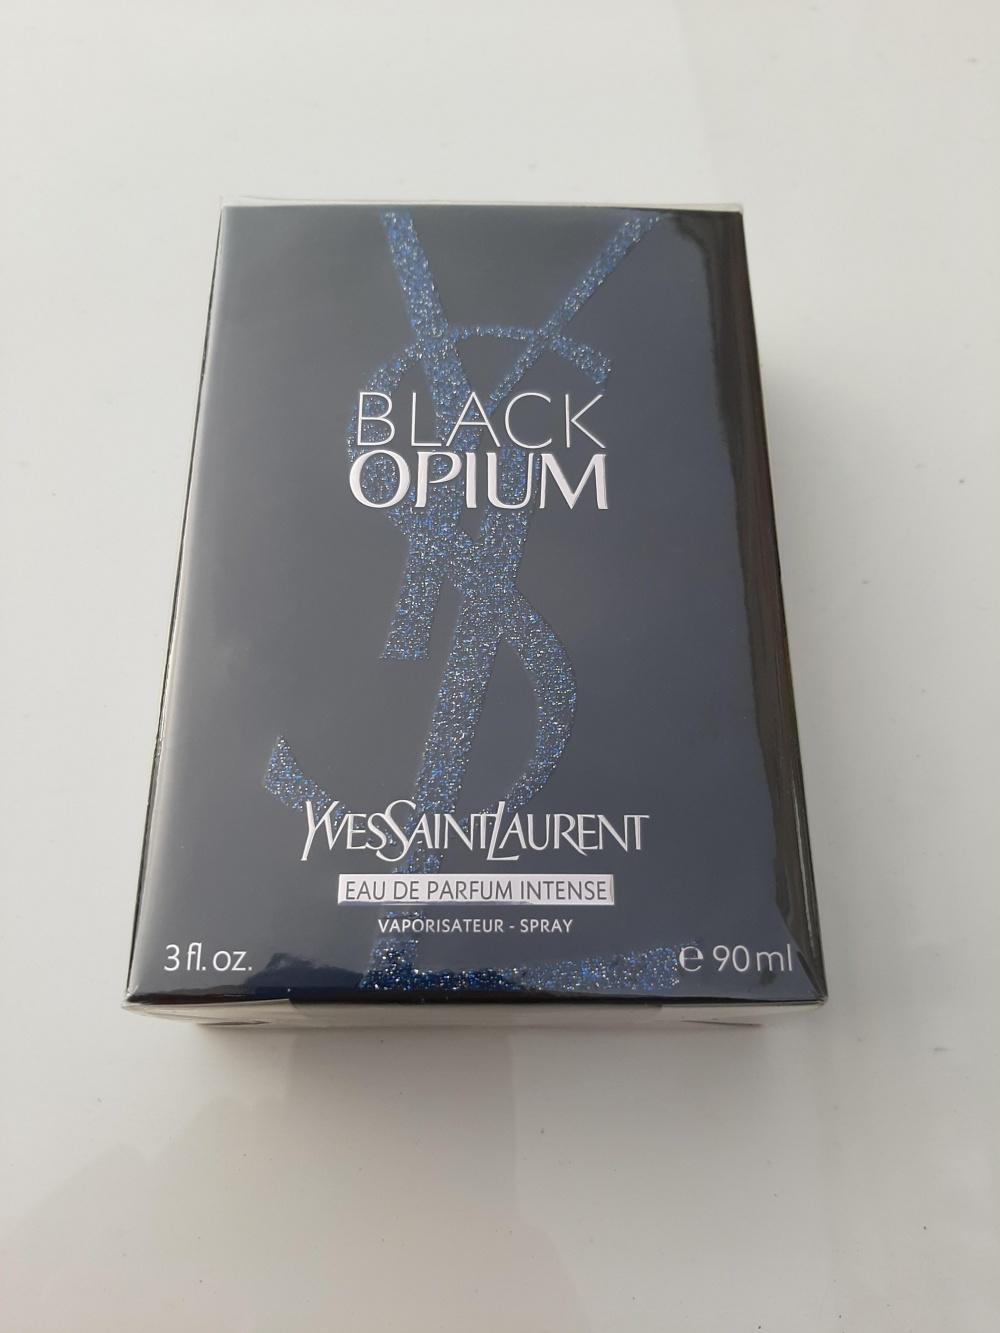 Парфюмерная вода Yves Saint Laurent Black Opium Eau De Parfum Intense | 90 мл